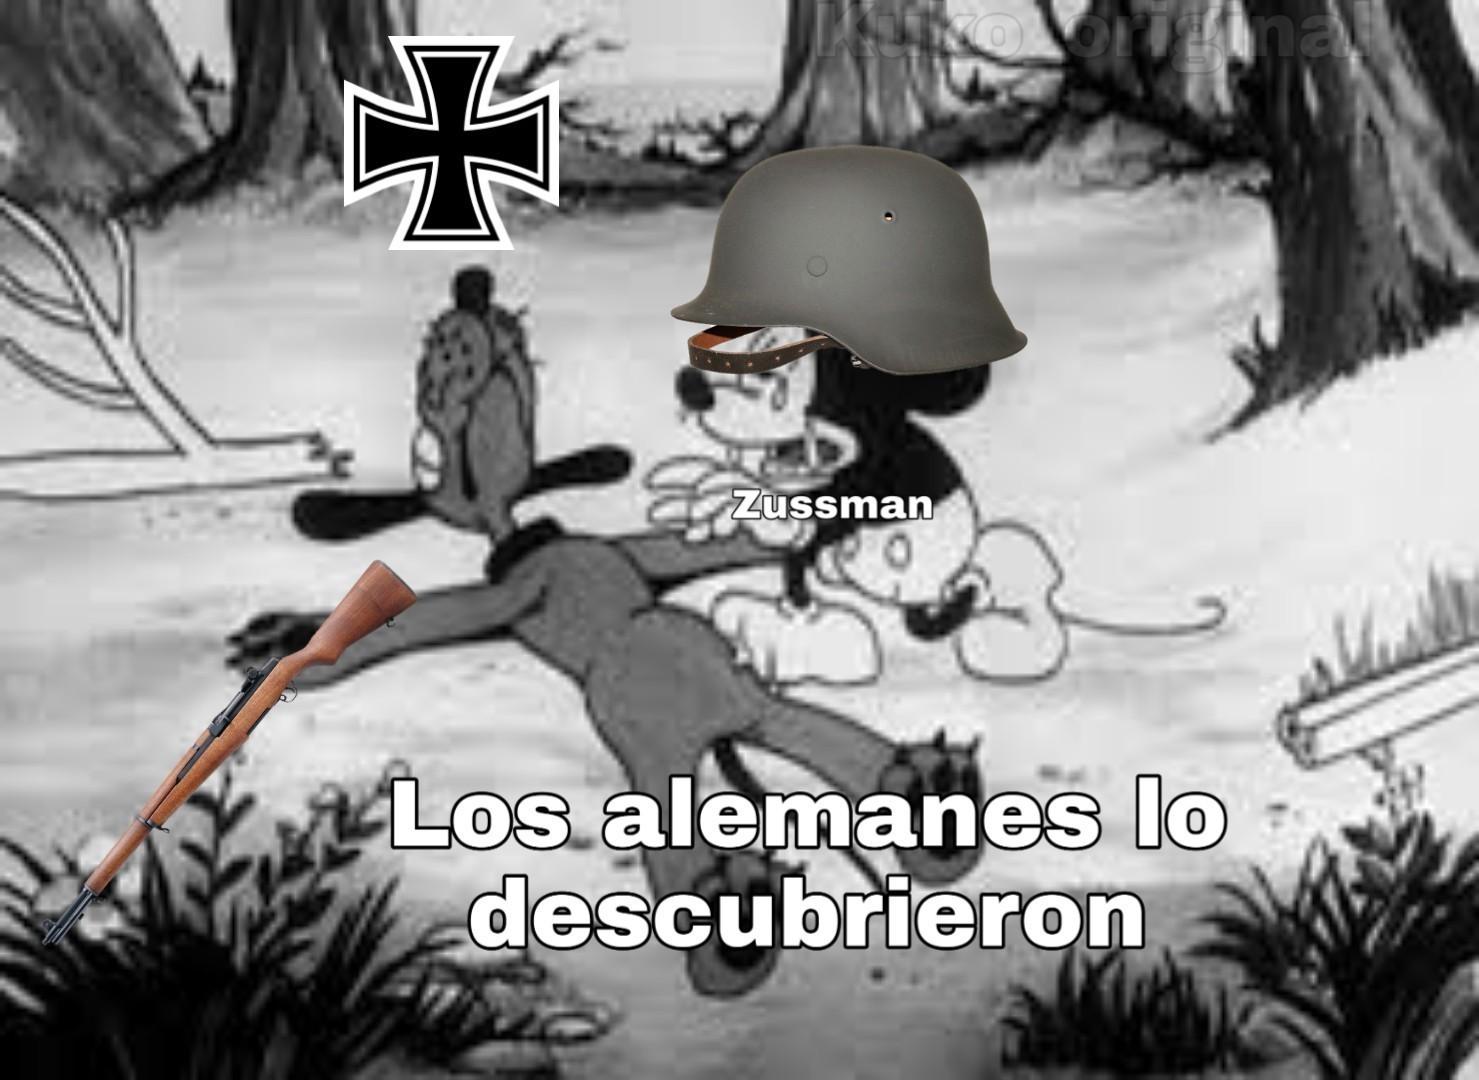 Call of duty WW2 - meme